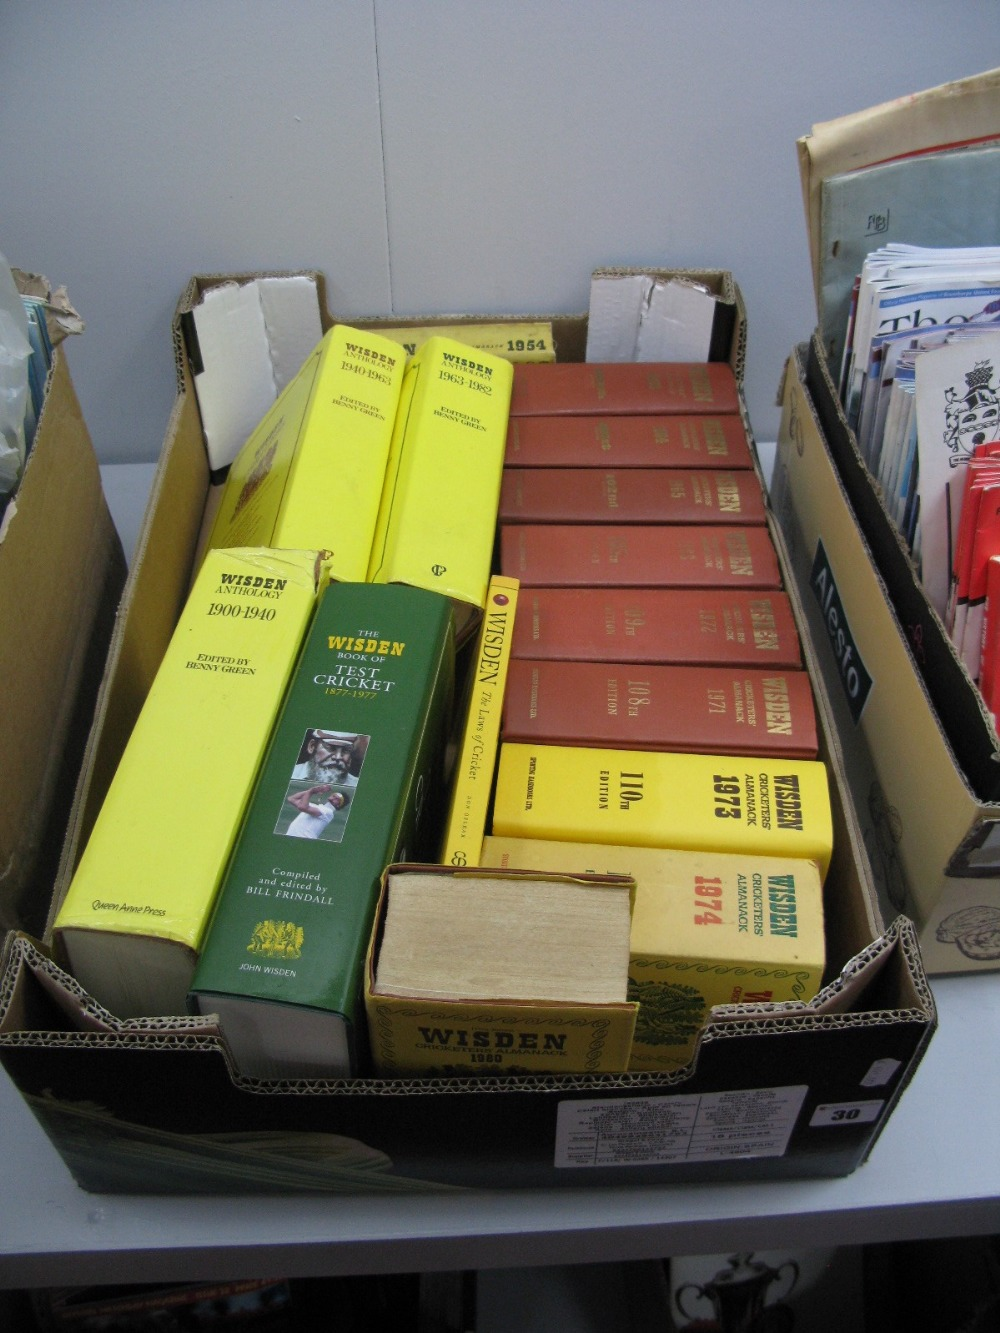 Lot 30 - Wisden Cricketers Almanacks, 1954, 63,64, 65, 68 71, 73, 74, 80, anthologies, etc:- One Box